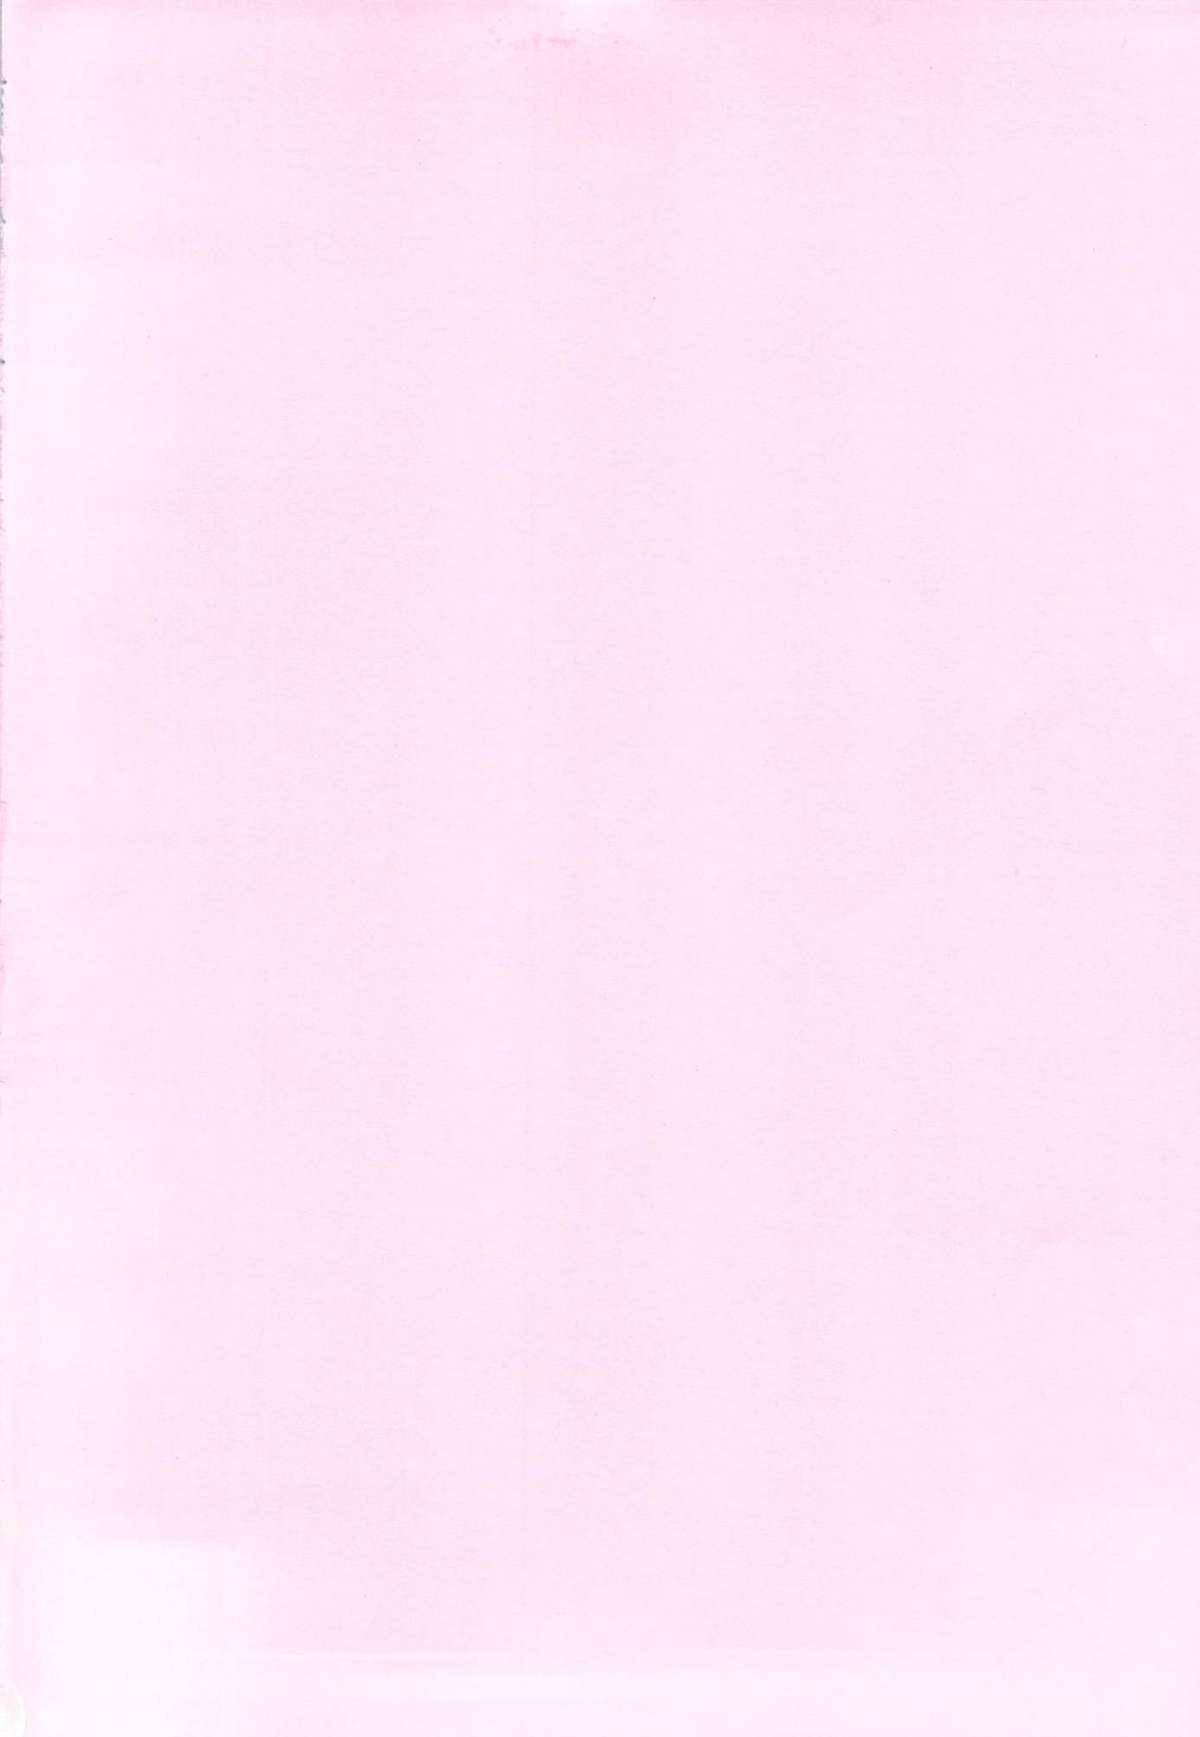 Bou Yuumei Koukou Joshi Toilet Tousatsu 2-jigen Bishoujo Hen Vol. 4 0